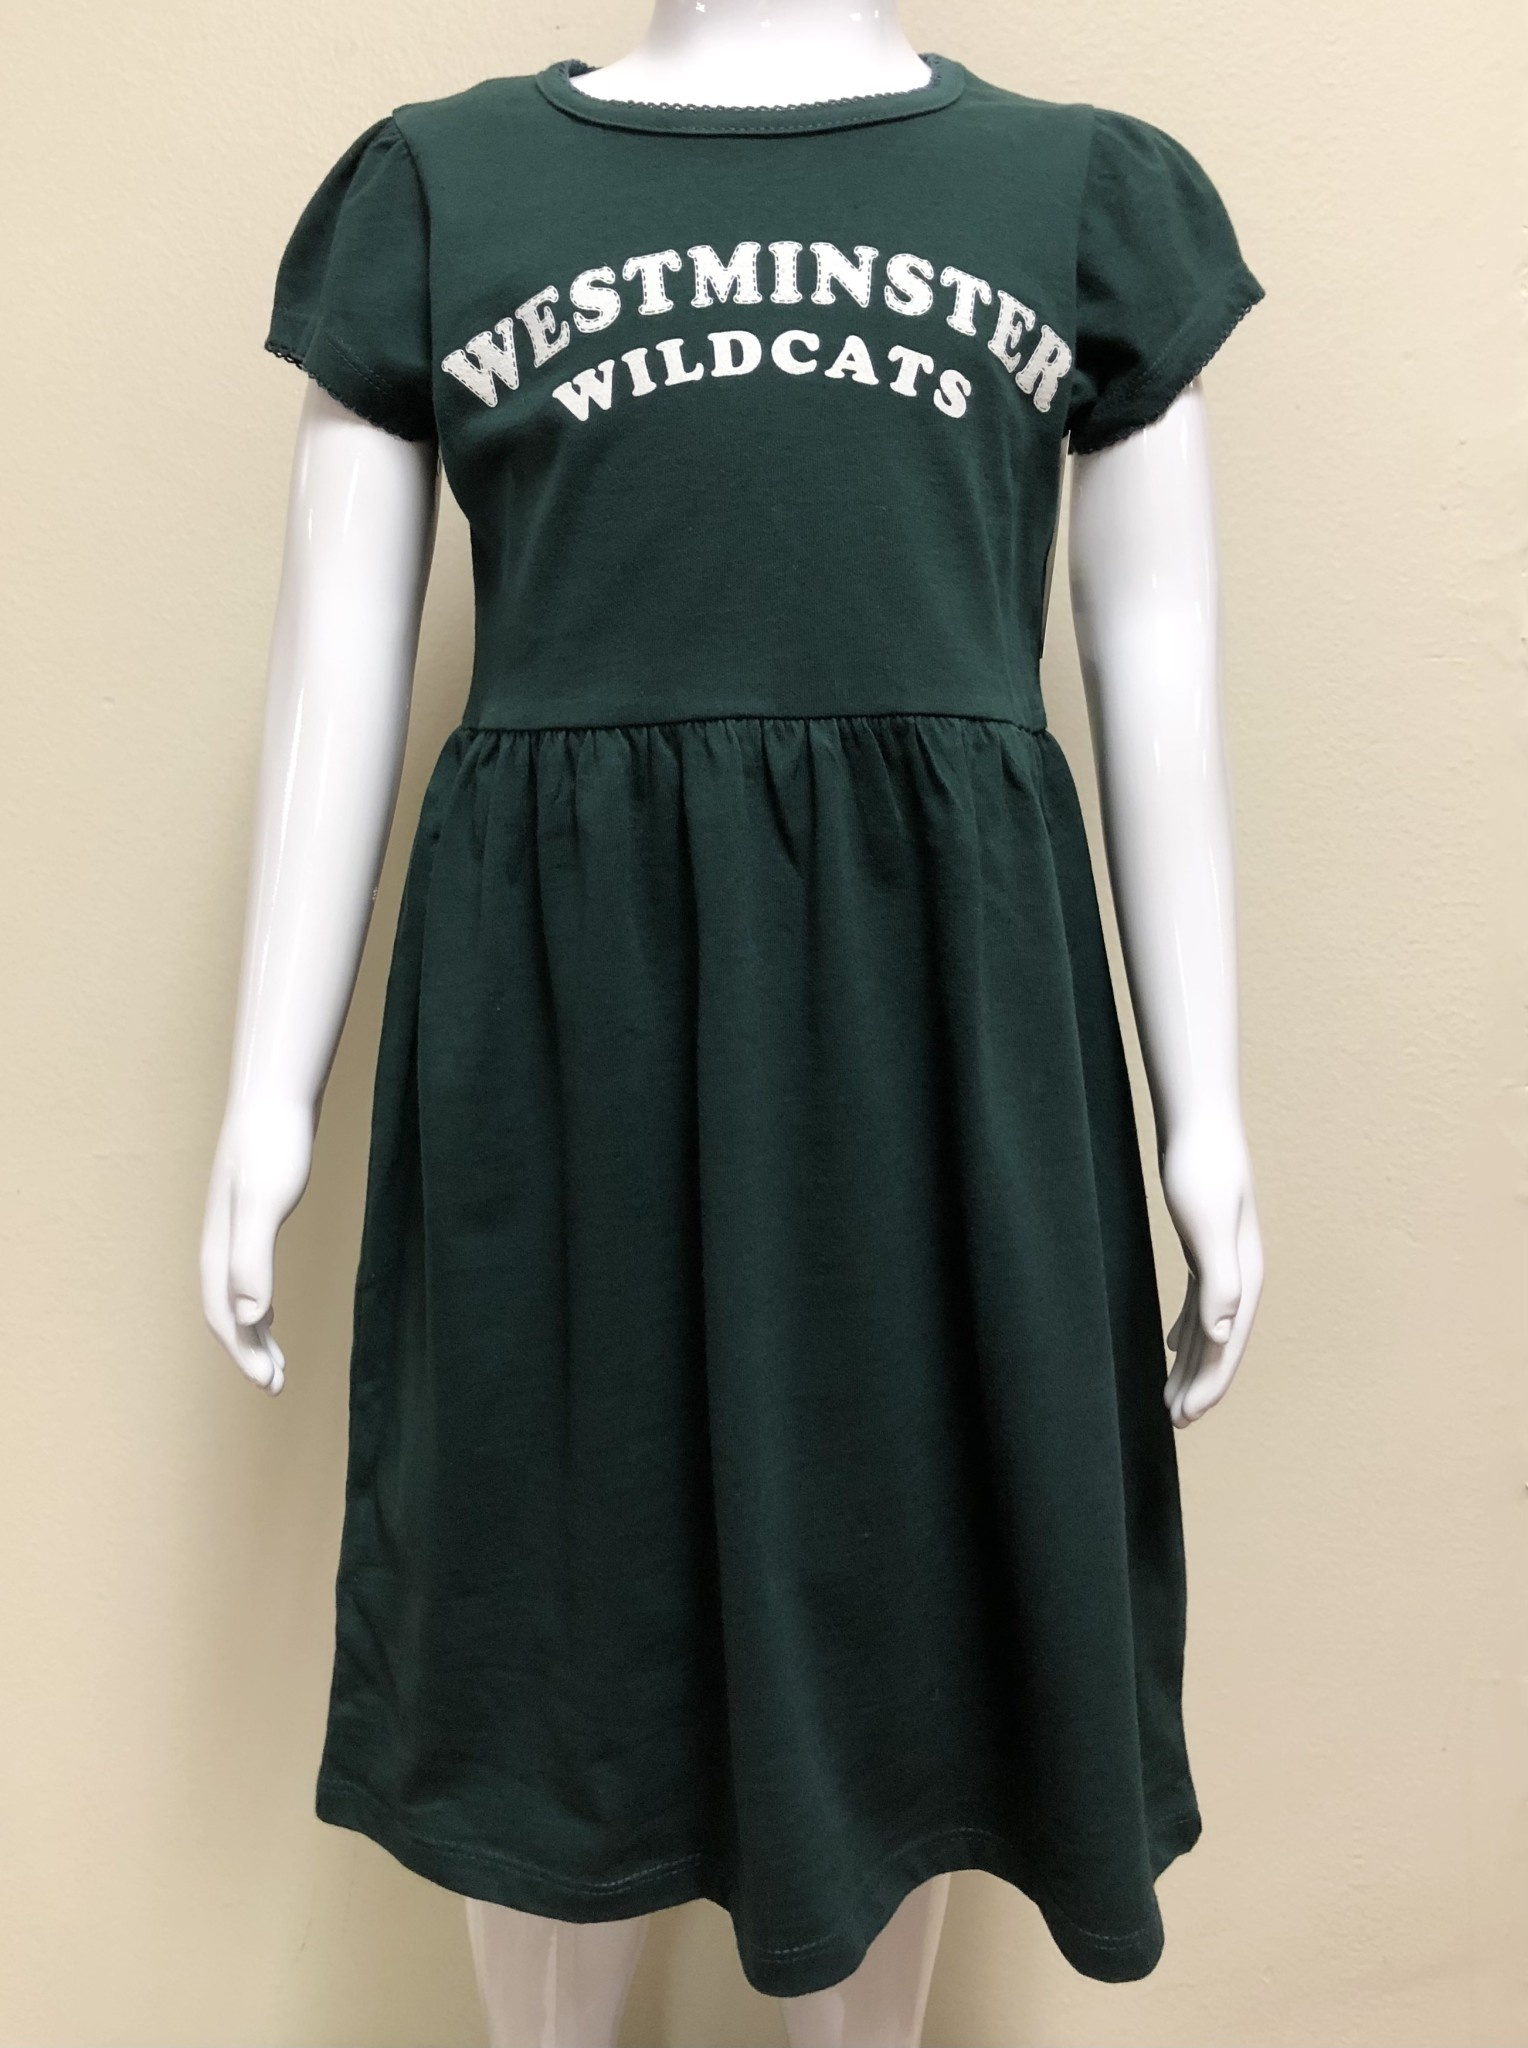 College Kids Dress: College Kids - 5/6 Youth Girls - Dark Green Holly Jane Dress